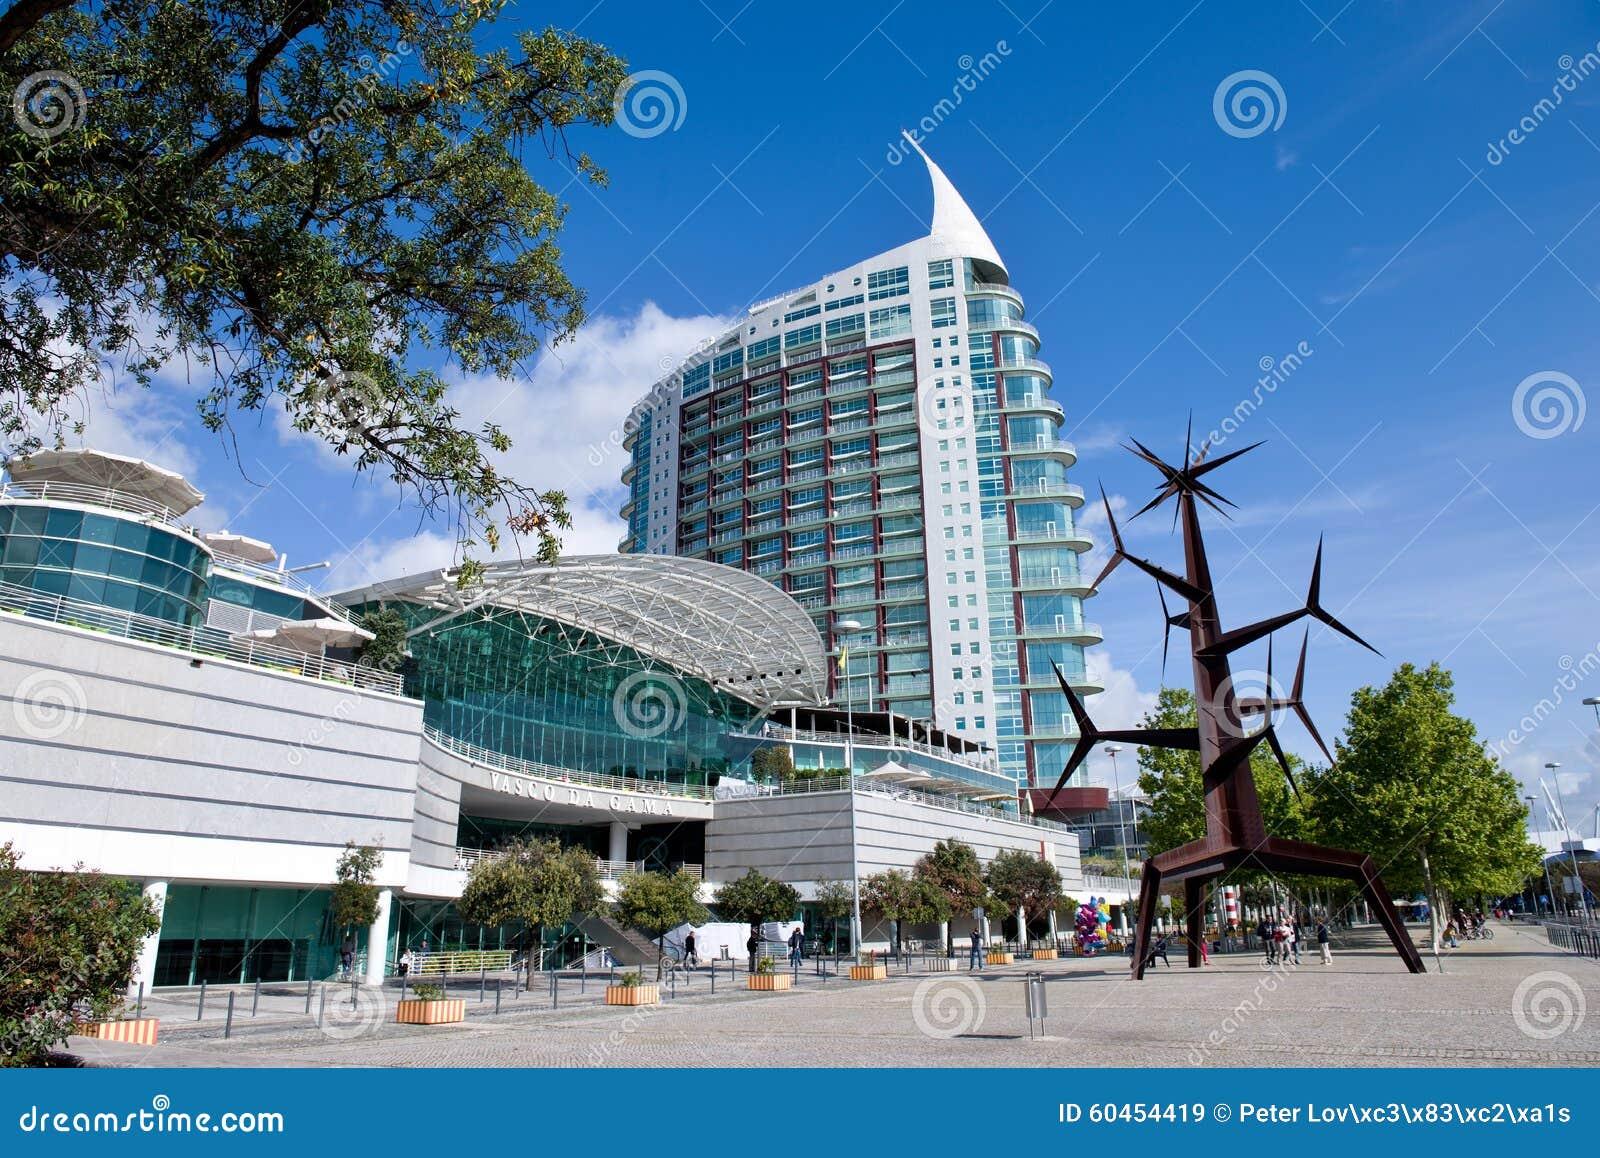 Vasco da Gama Shopping - parc des nations - Lisbonne